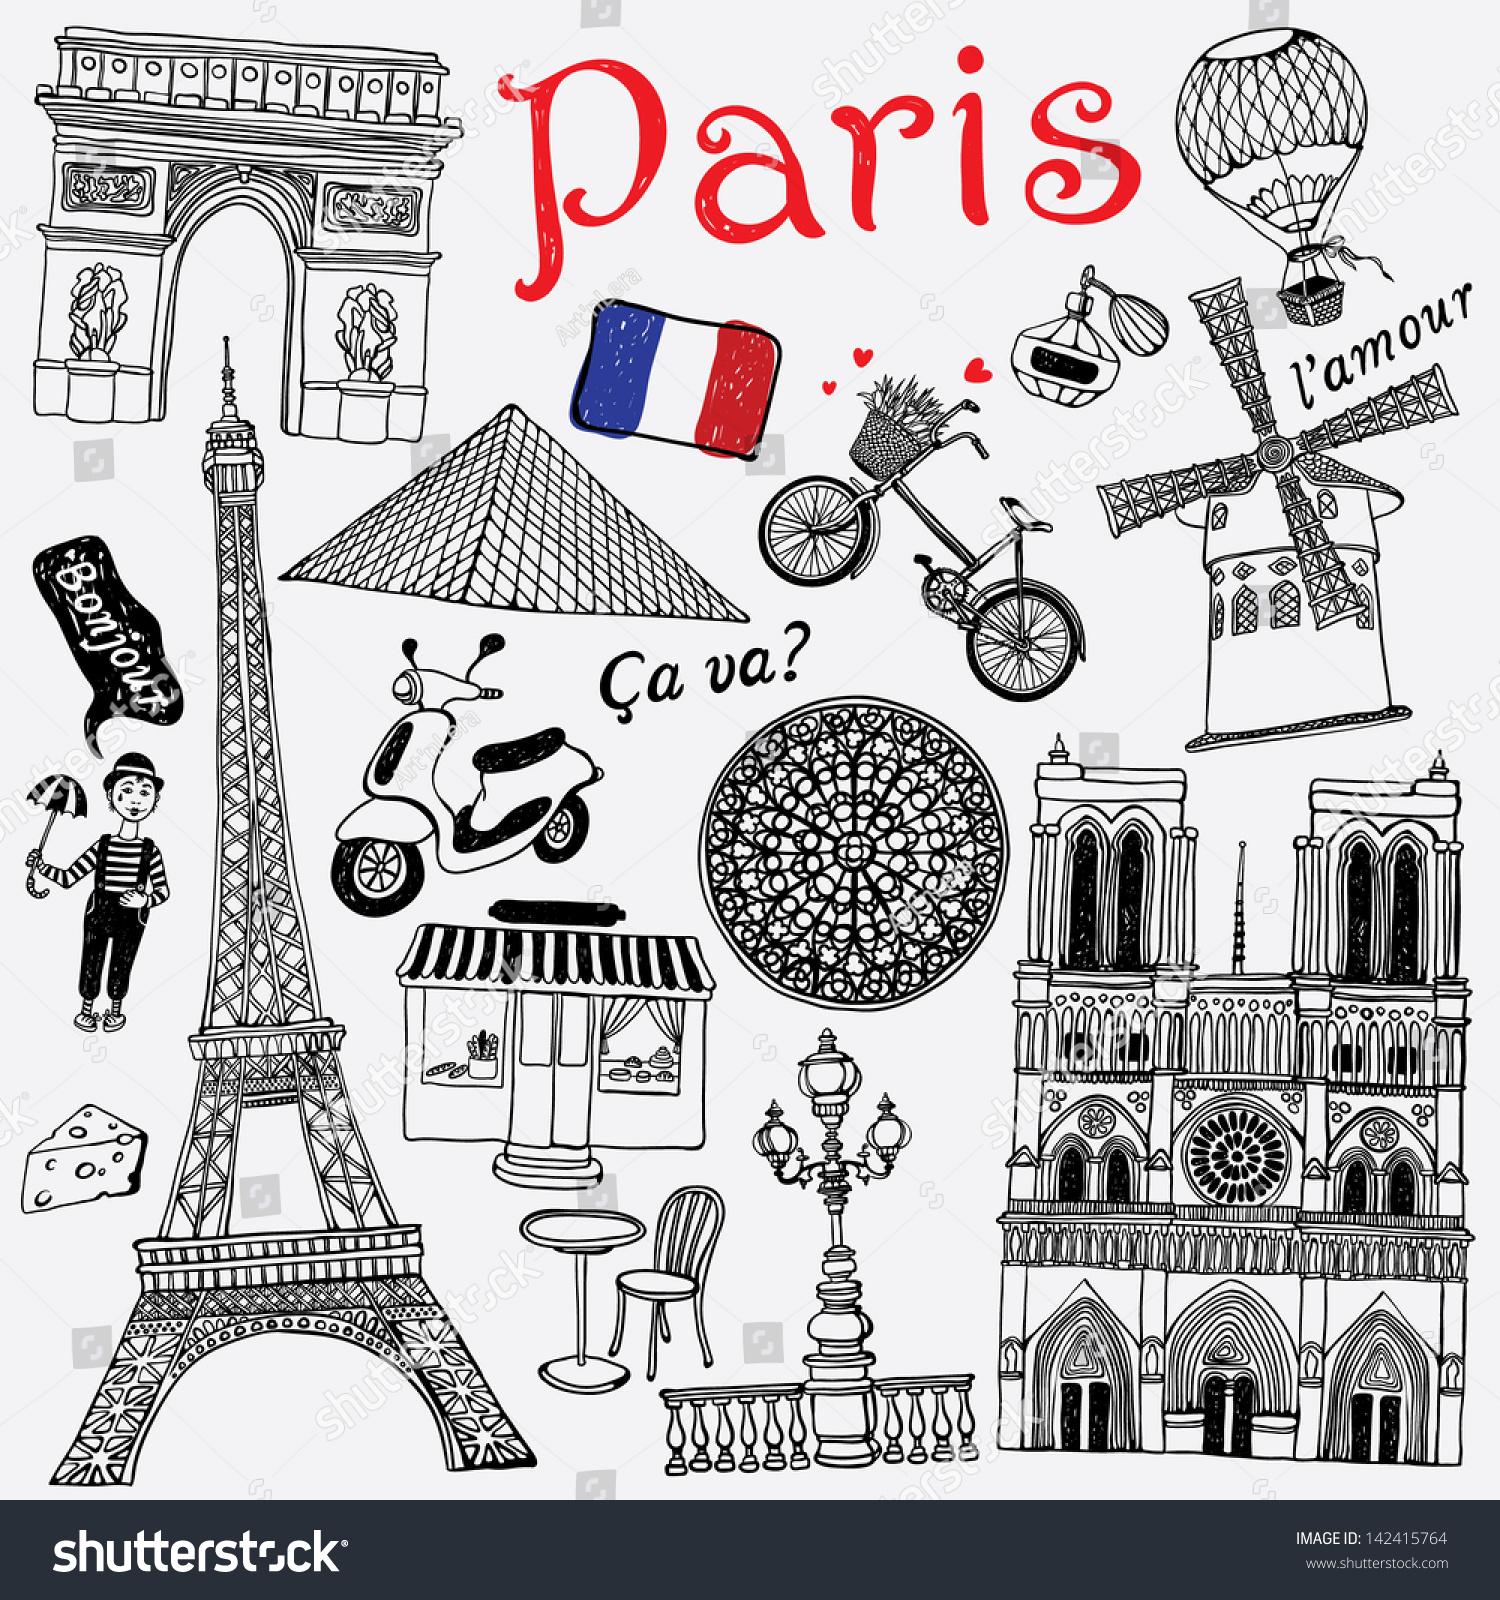 Paris Illustration: Paris Illustration Stock Vector 142415764